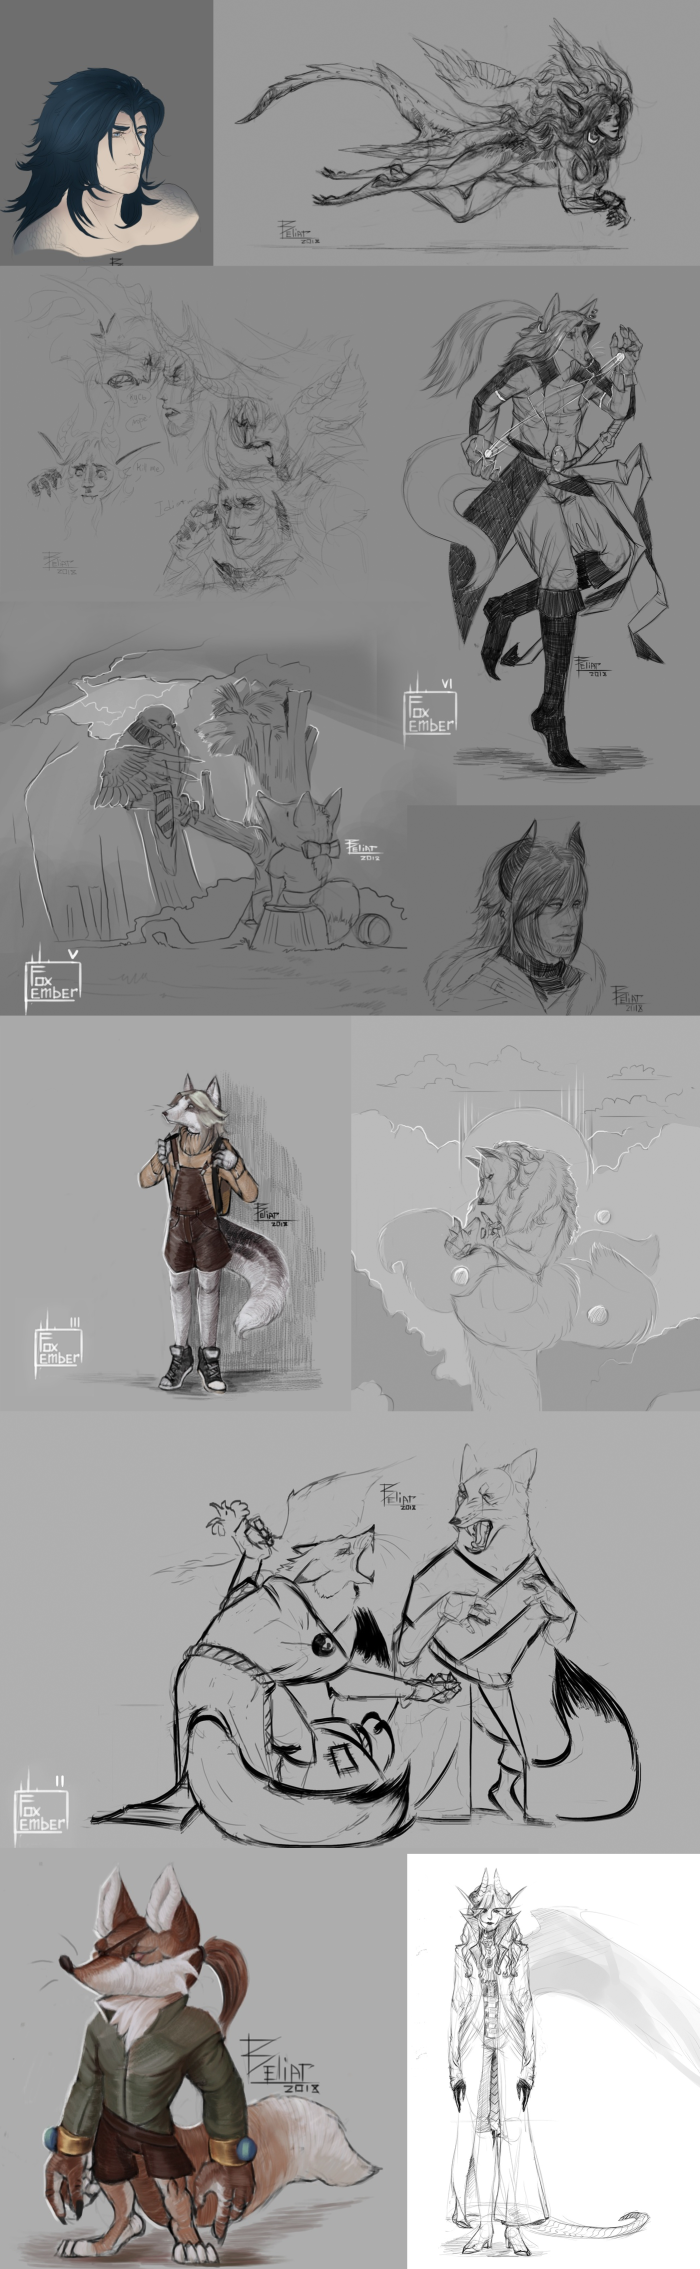 #original_characters #dragon #skecth #fox #raven #devil #fairy   Скетчи за осень 2018  | Author: Beliar